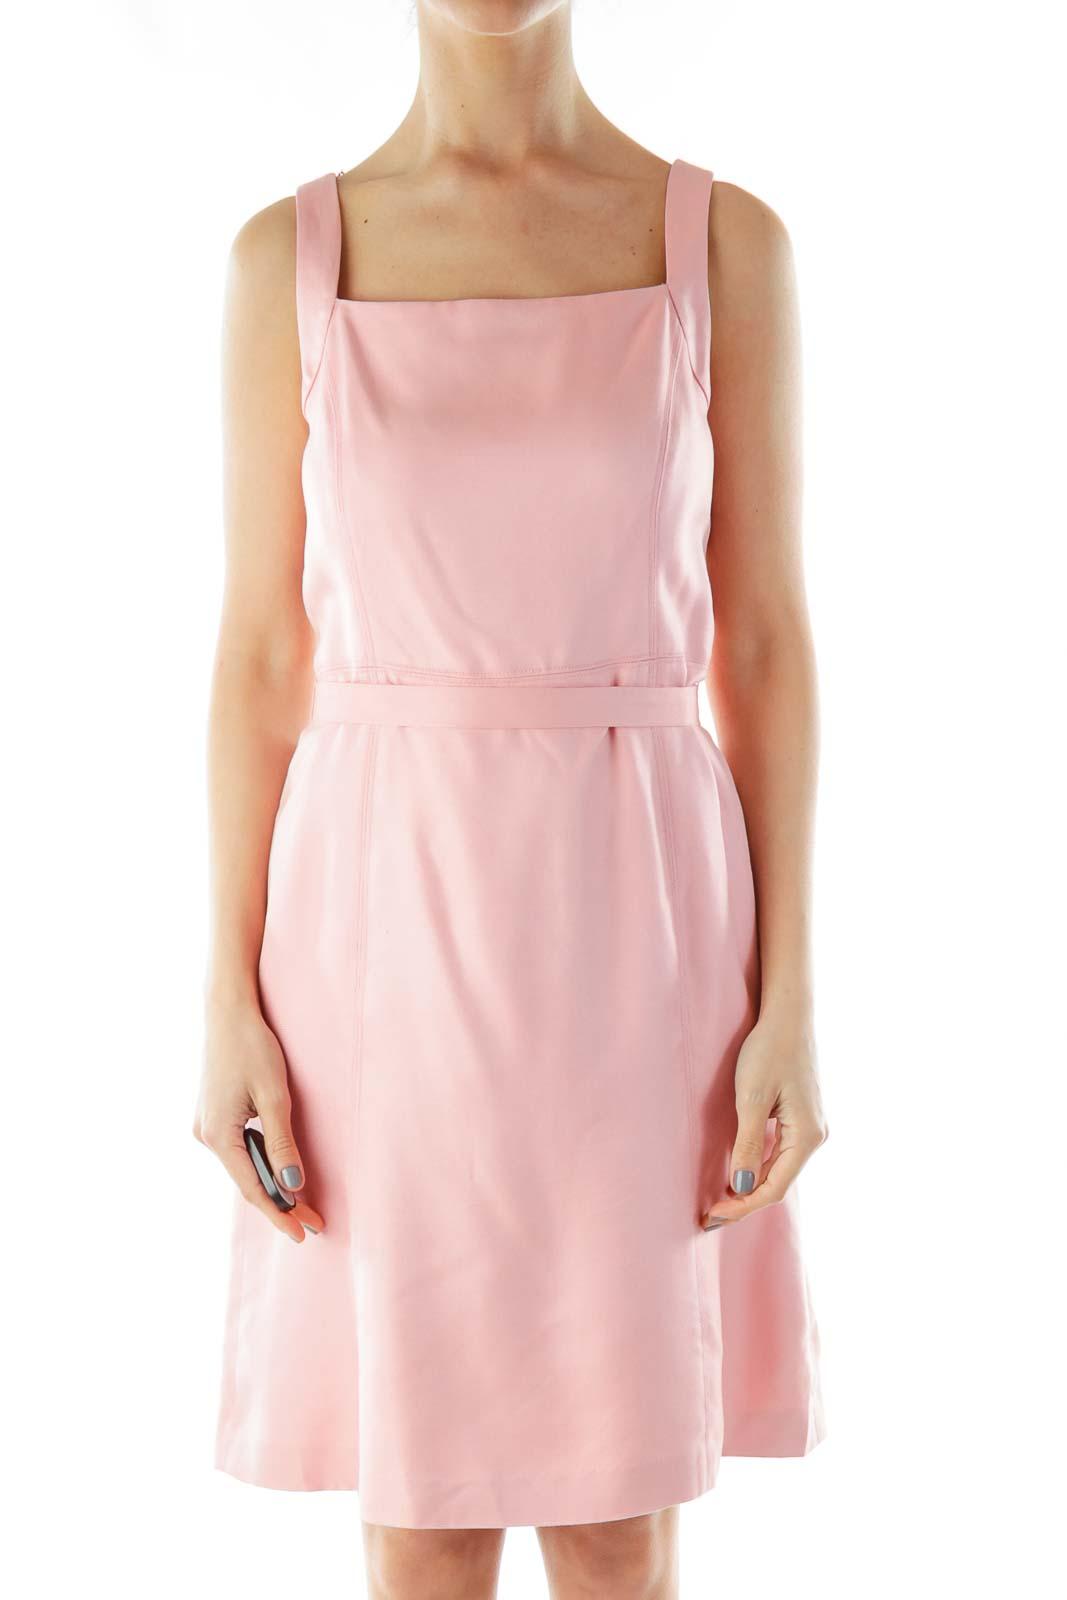 Pink Silk Apron Dress Front